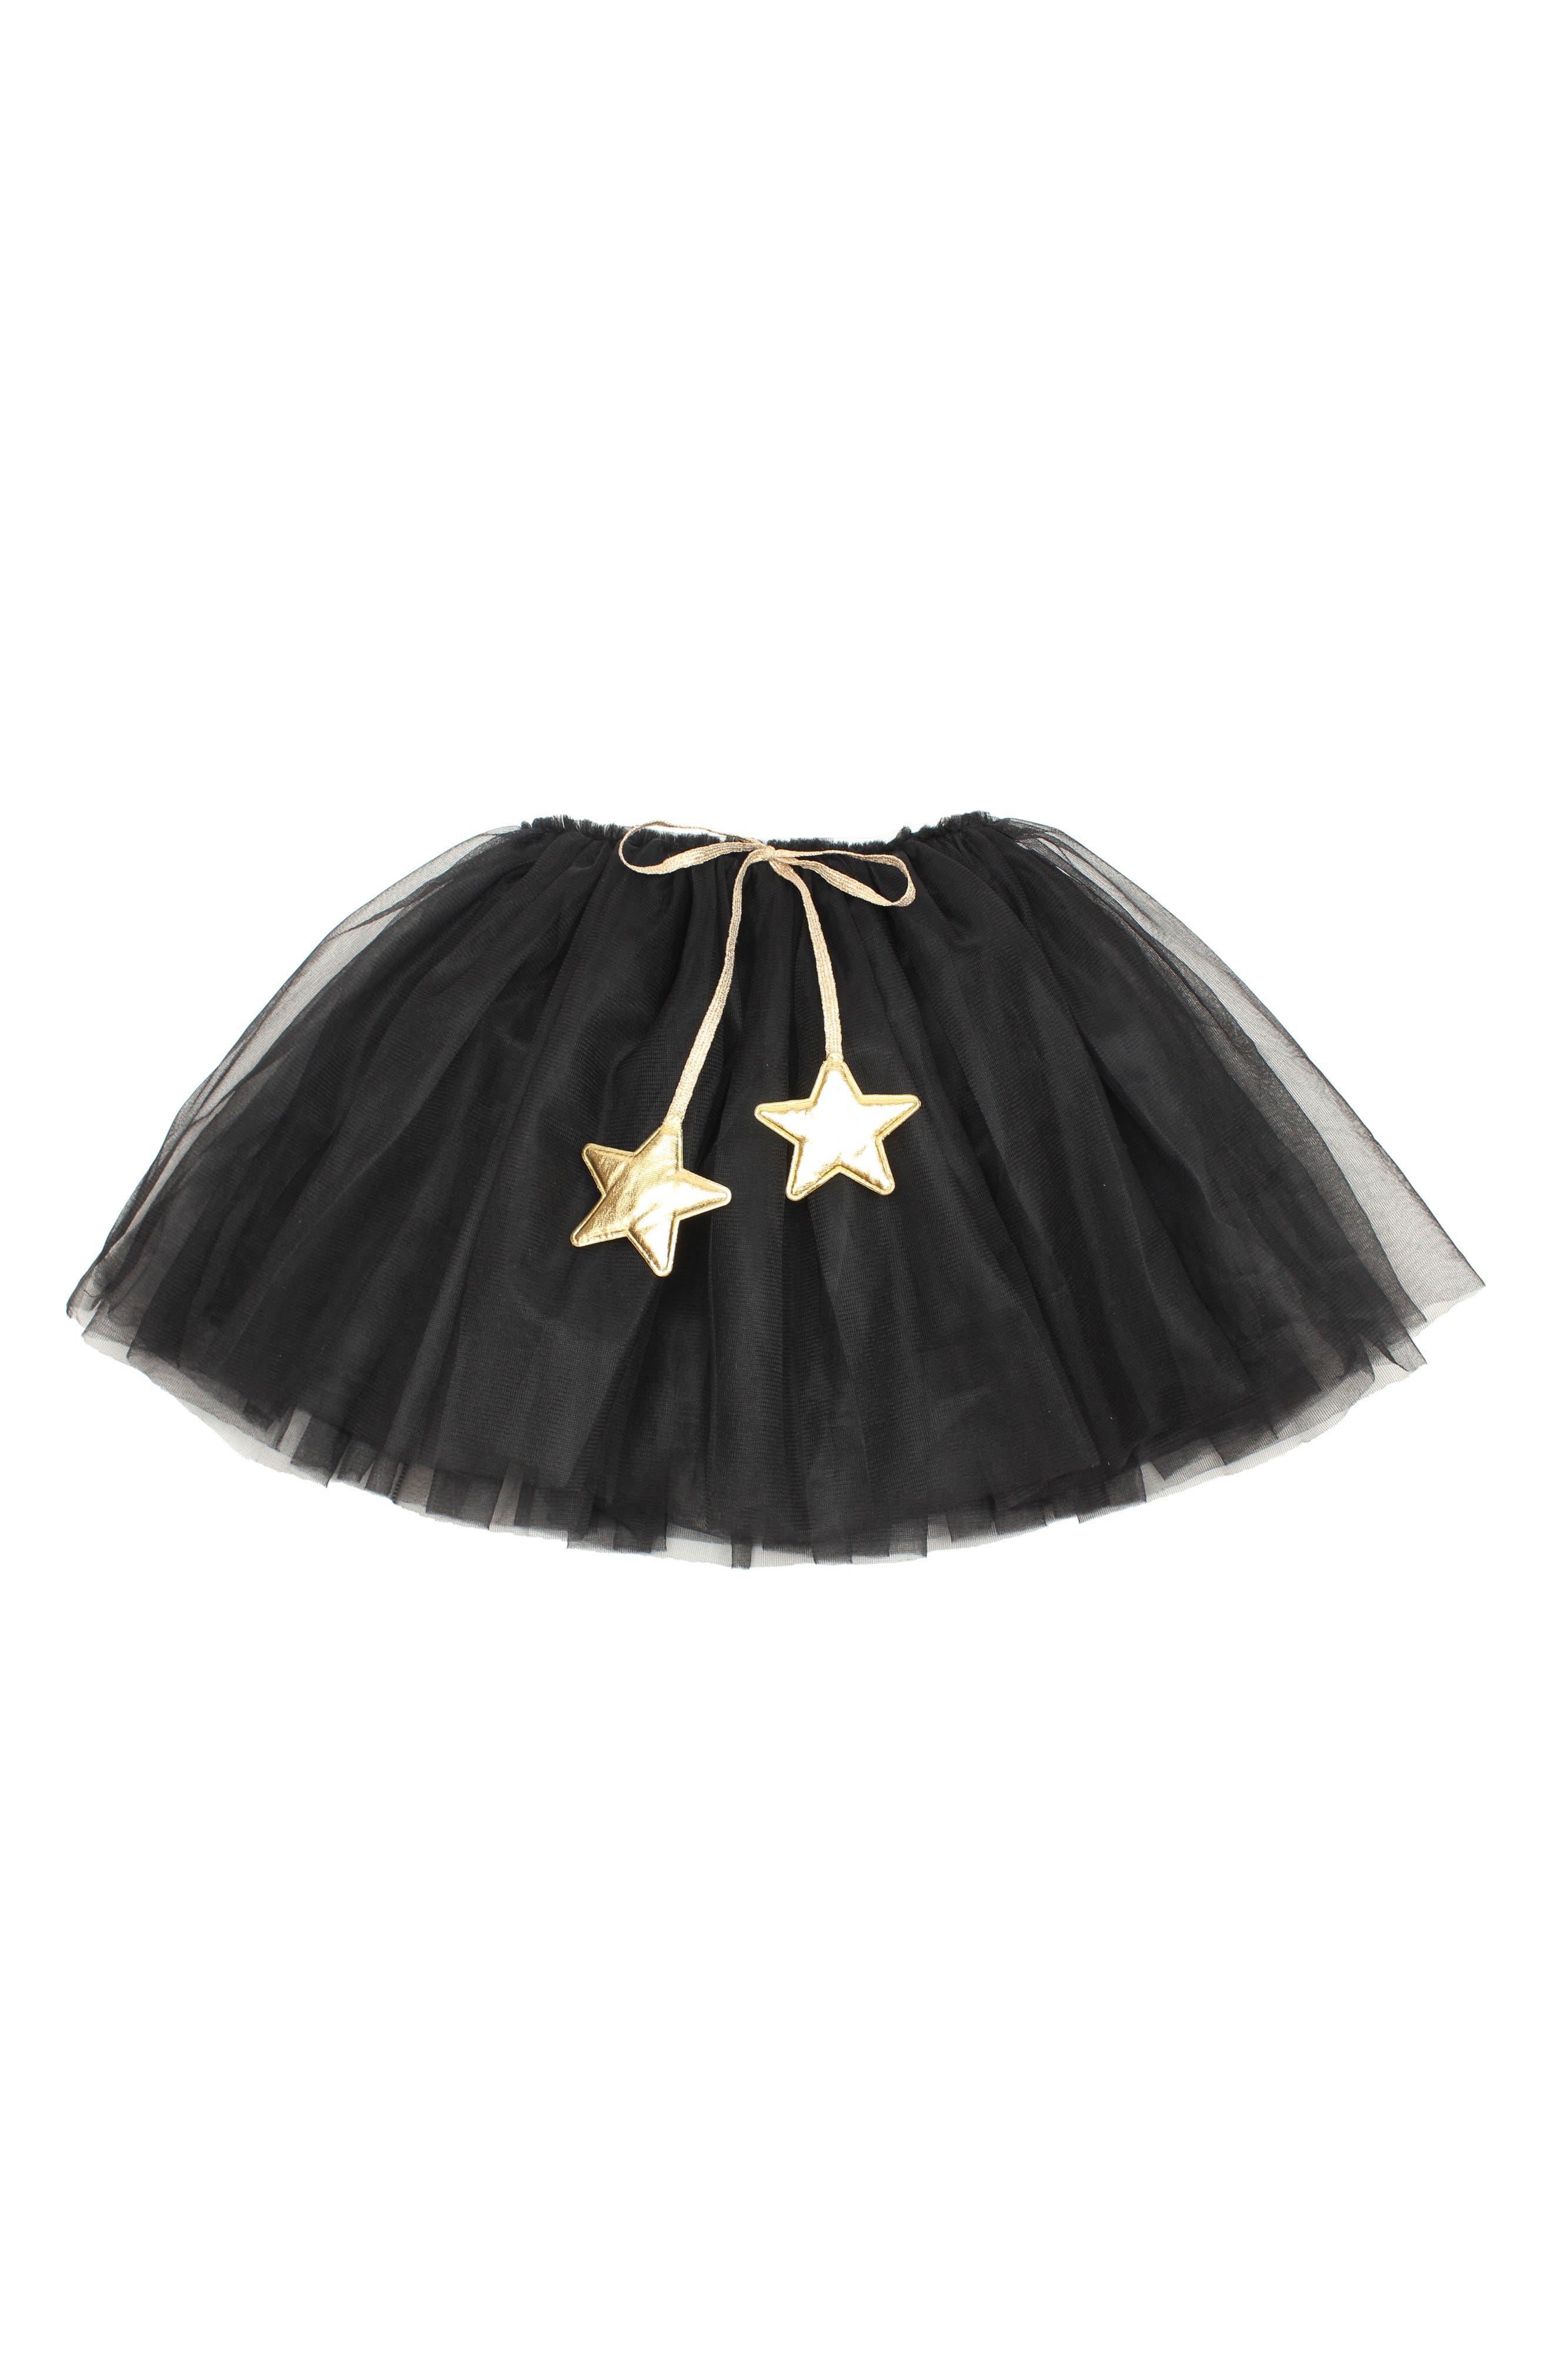 Gold Star Tutu Skirt,                         Main,                         color, Black